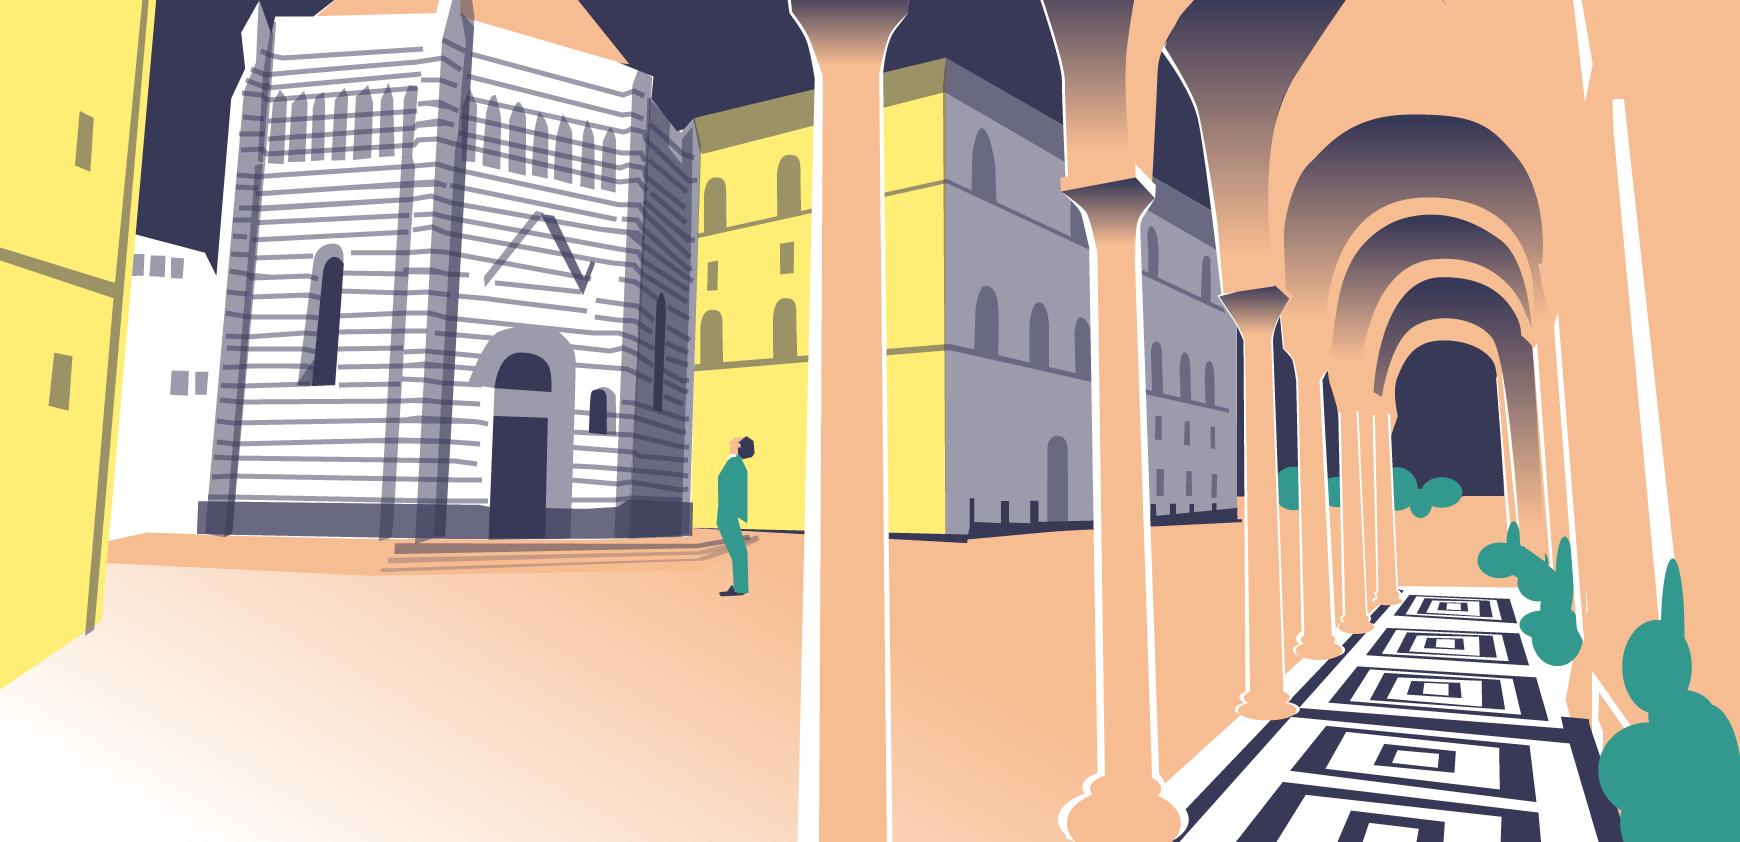 Pistoia 2017 - illustration by Anna Horváth - CCT